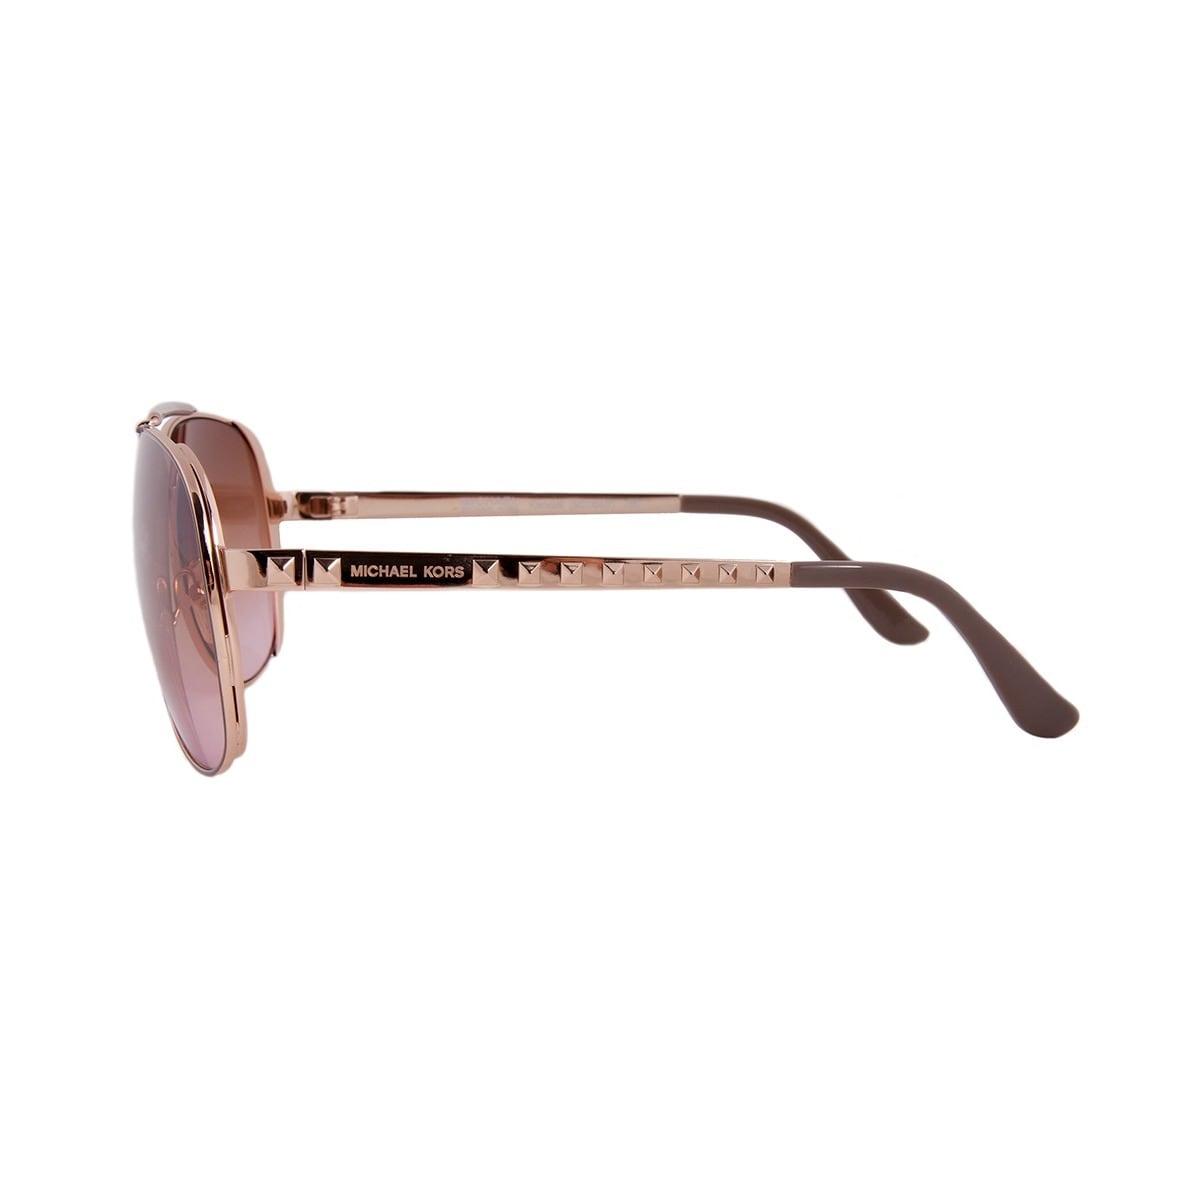 Shop Michael Kors Women s M2064S Kendall Aviator Rose  Gold Sunglasses -  Free Shipping Today - Overstock.com - 9800971 01ff7e977c